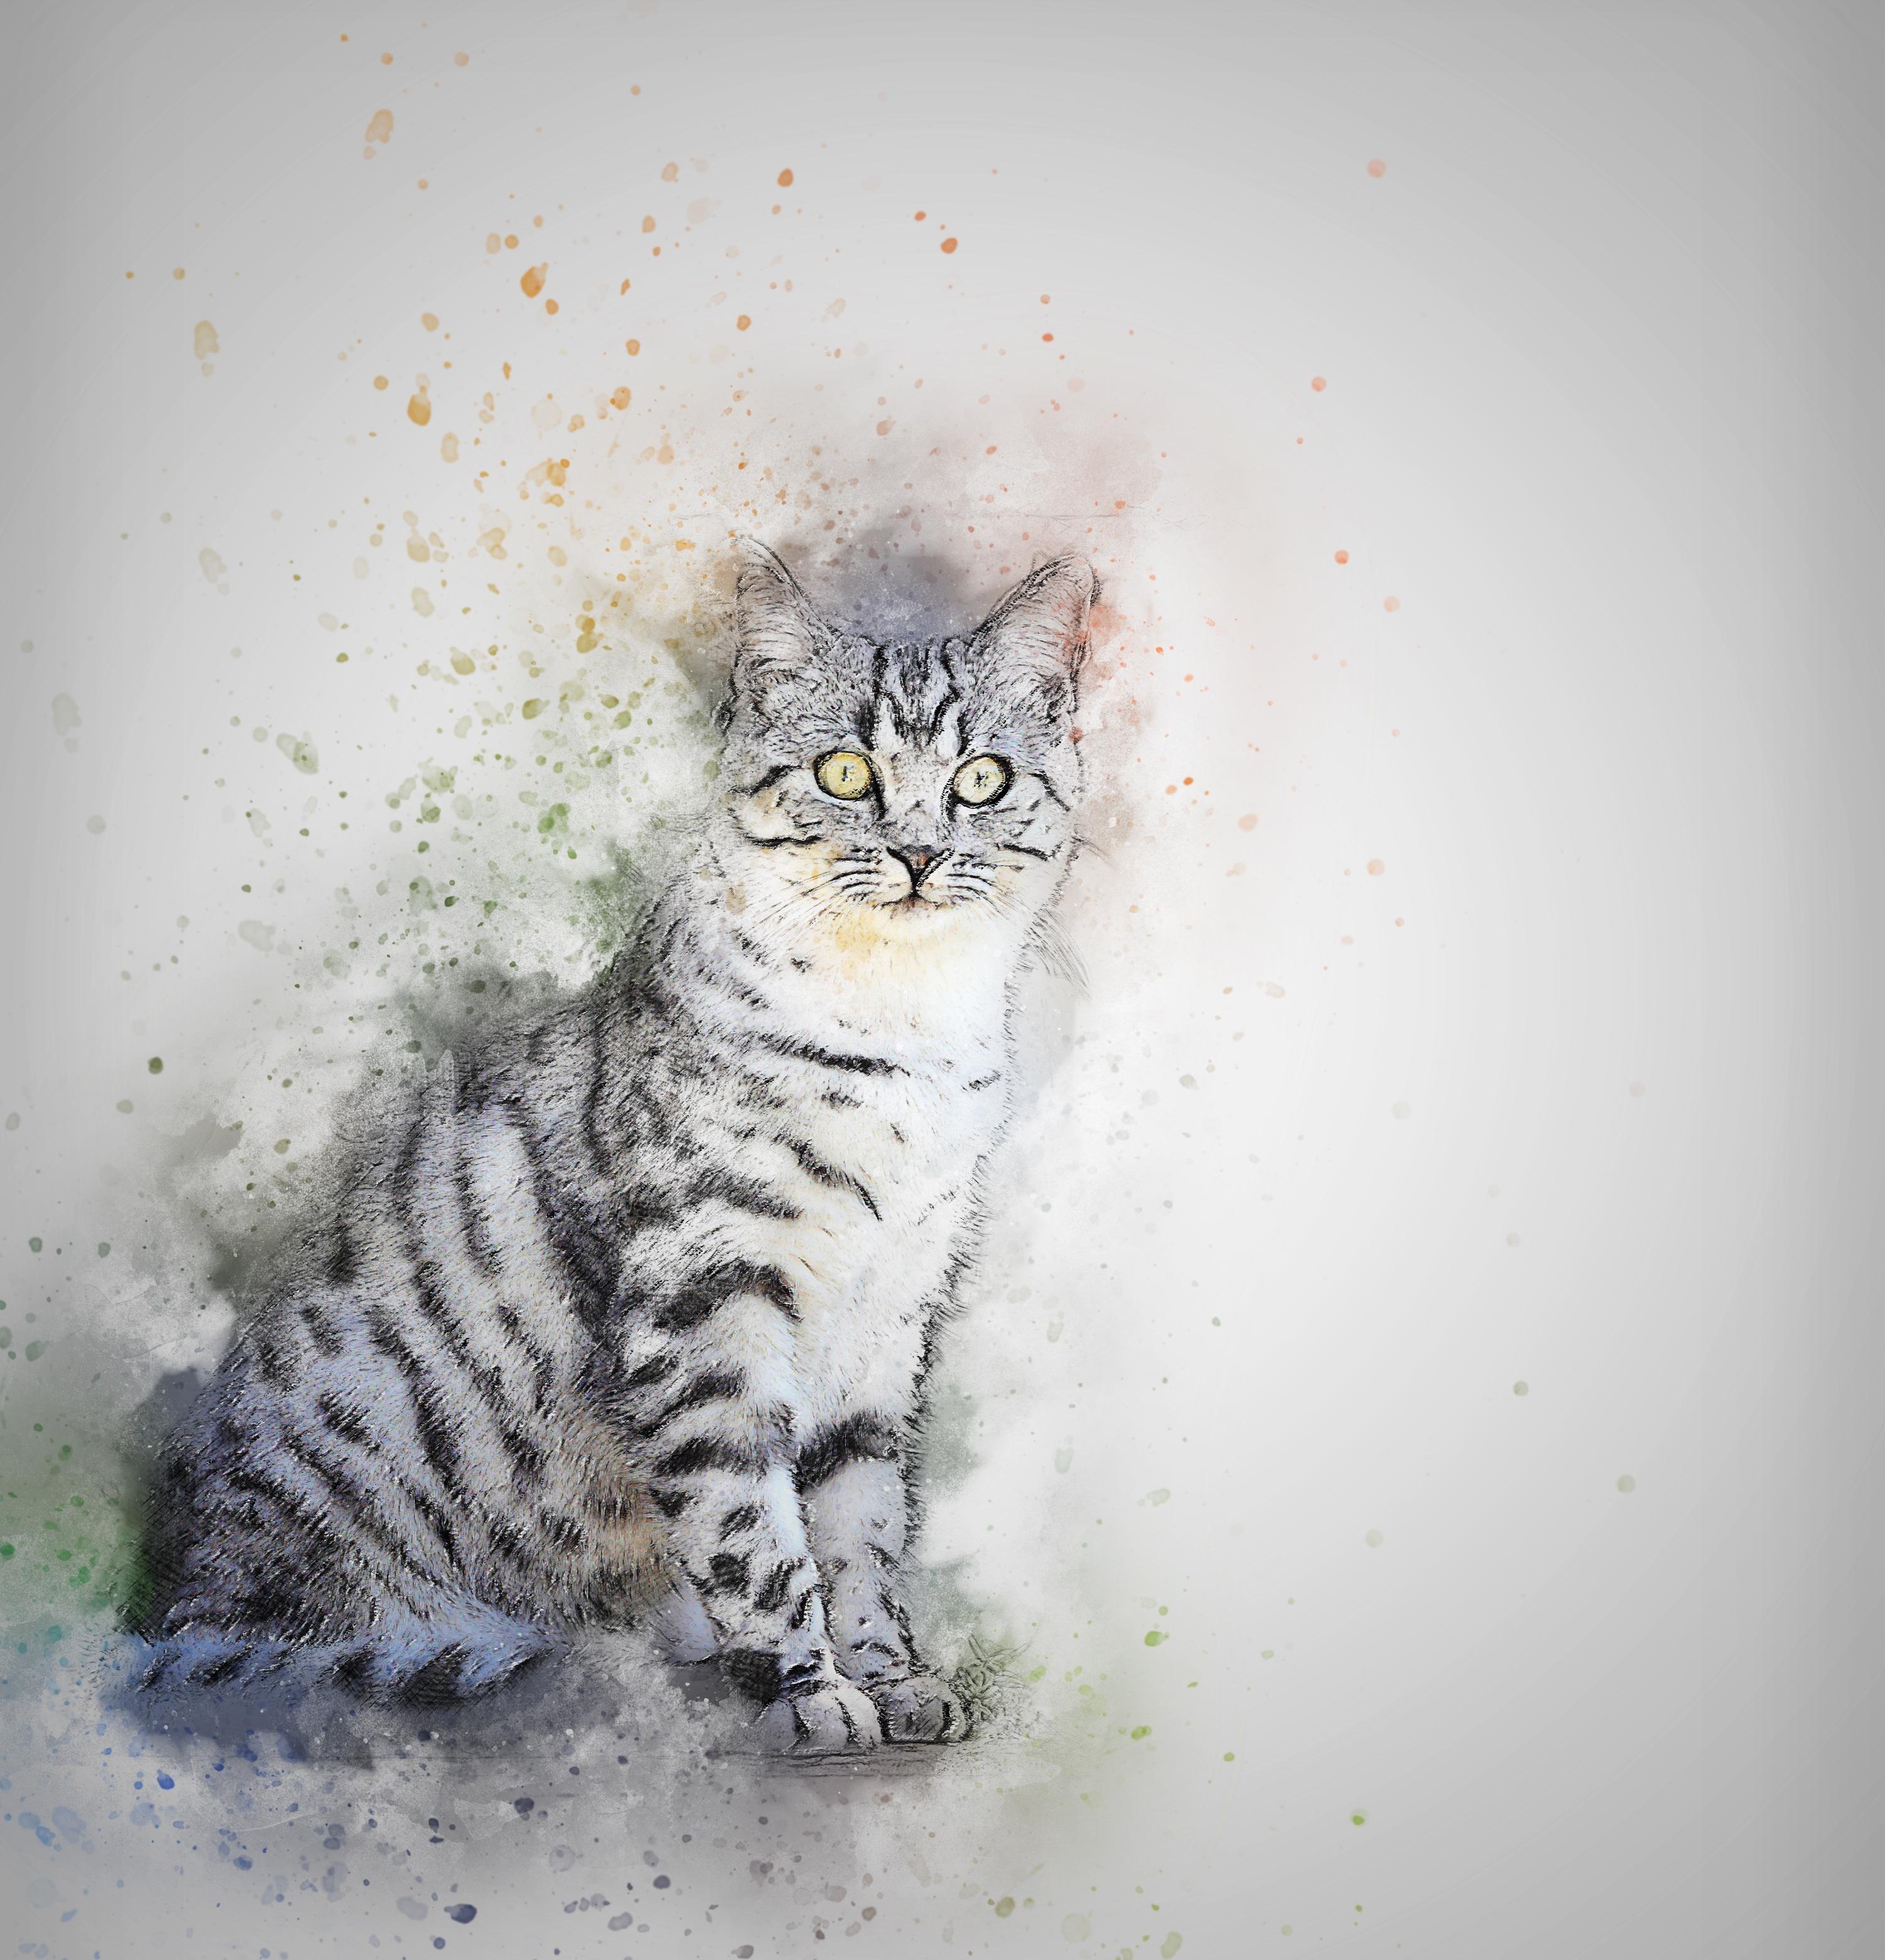 cat-2139040.jpg